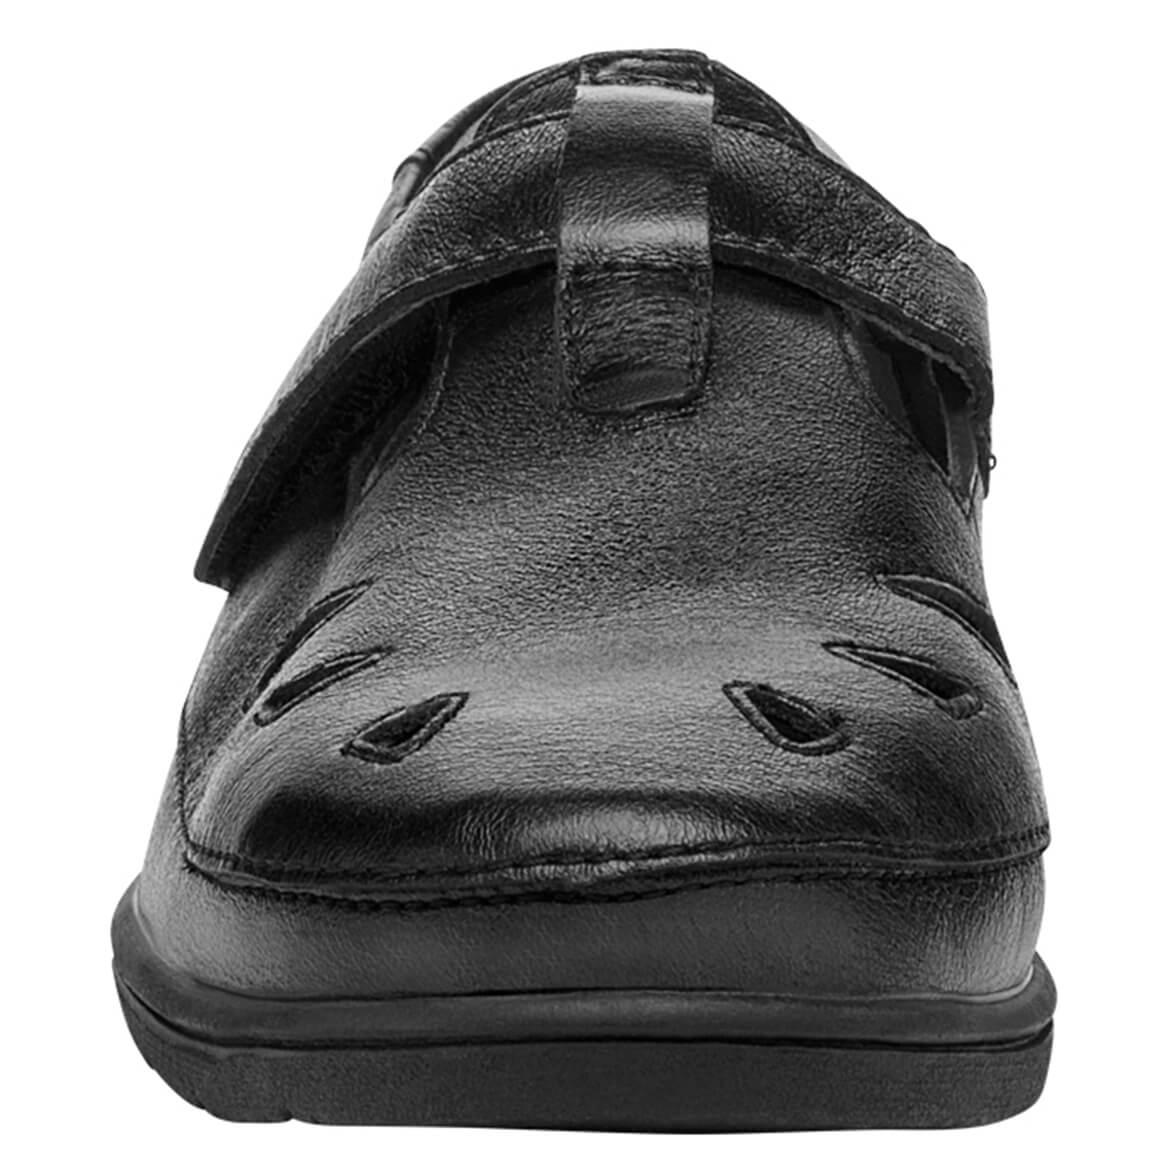 Propet® Ladybug Women's Walking Shoe-368360